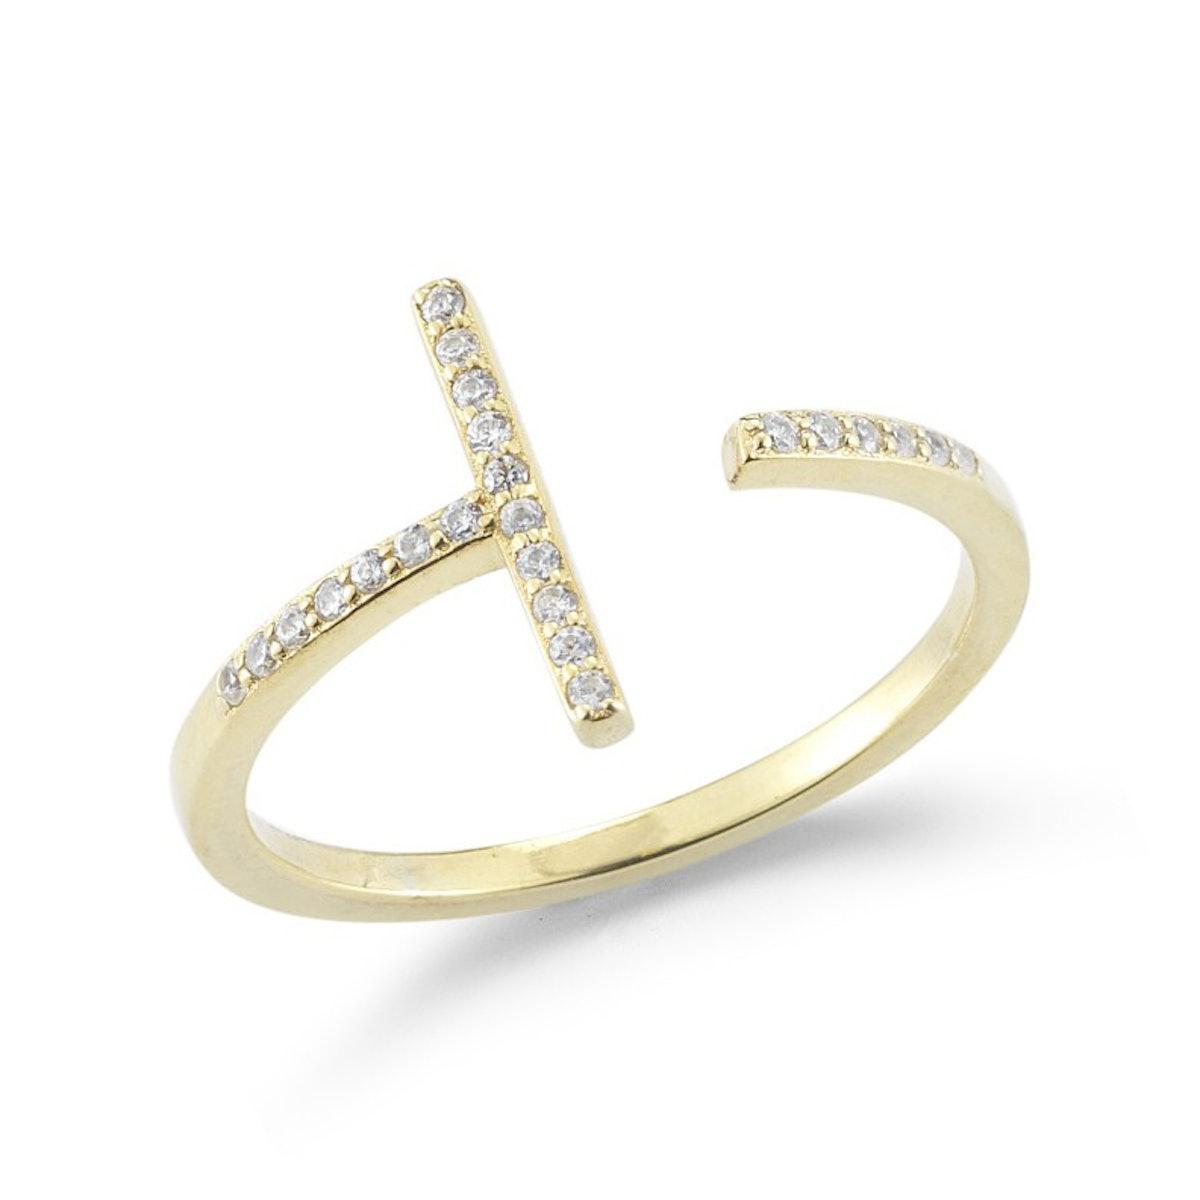 Mateo Bijoux ring